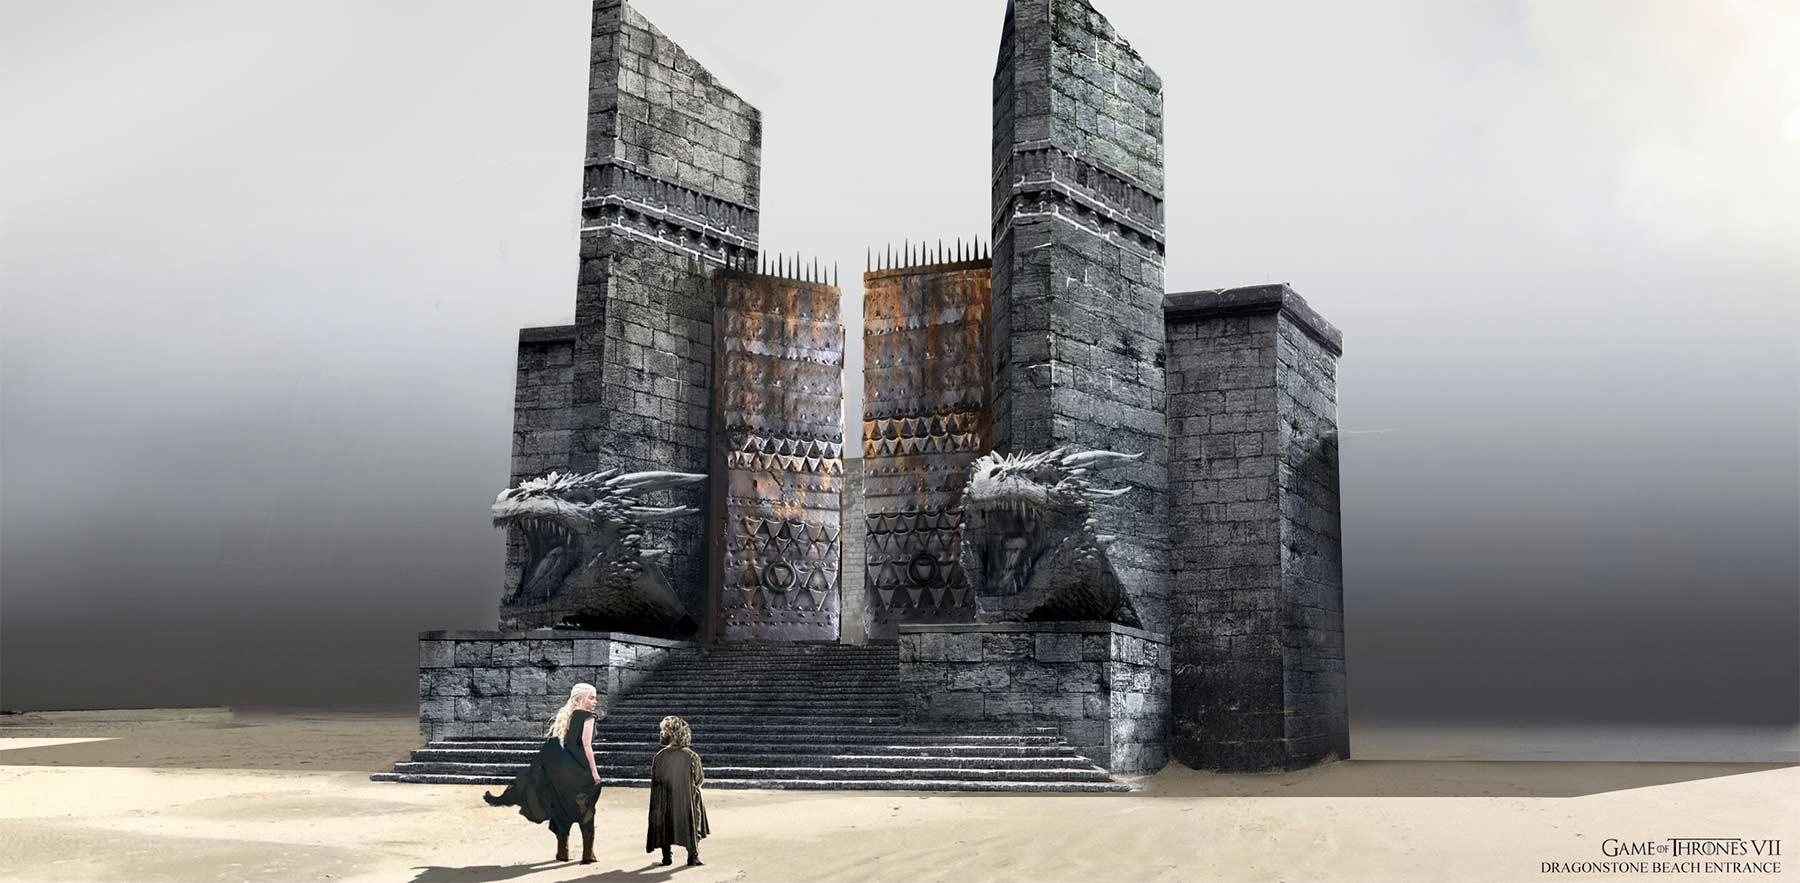 Game of Thrones Staffel 7 Concept Art Kieran-Belshaw-game-of-thrones-concept-art_03